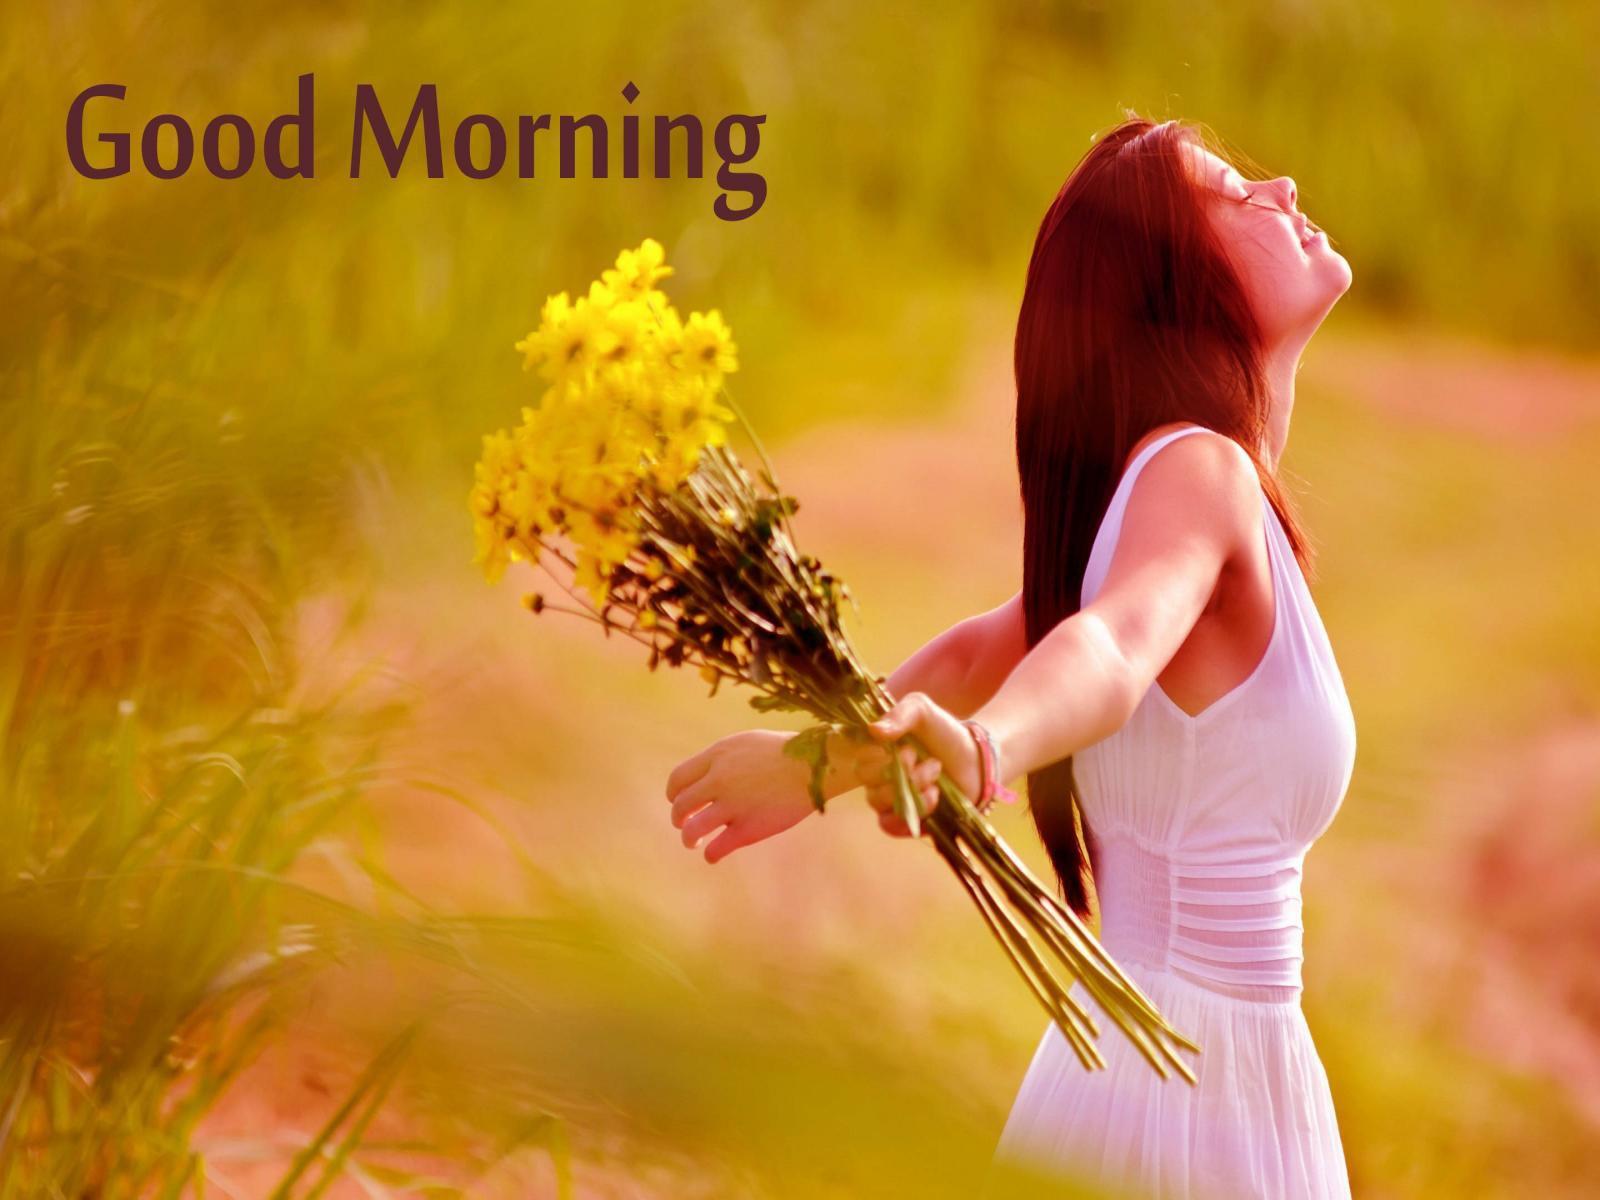 Good Morning With Beautiful Girls Hd Wallpaper Happy Good Morning